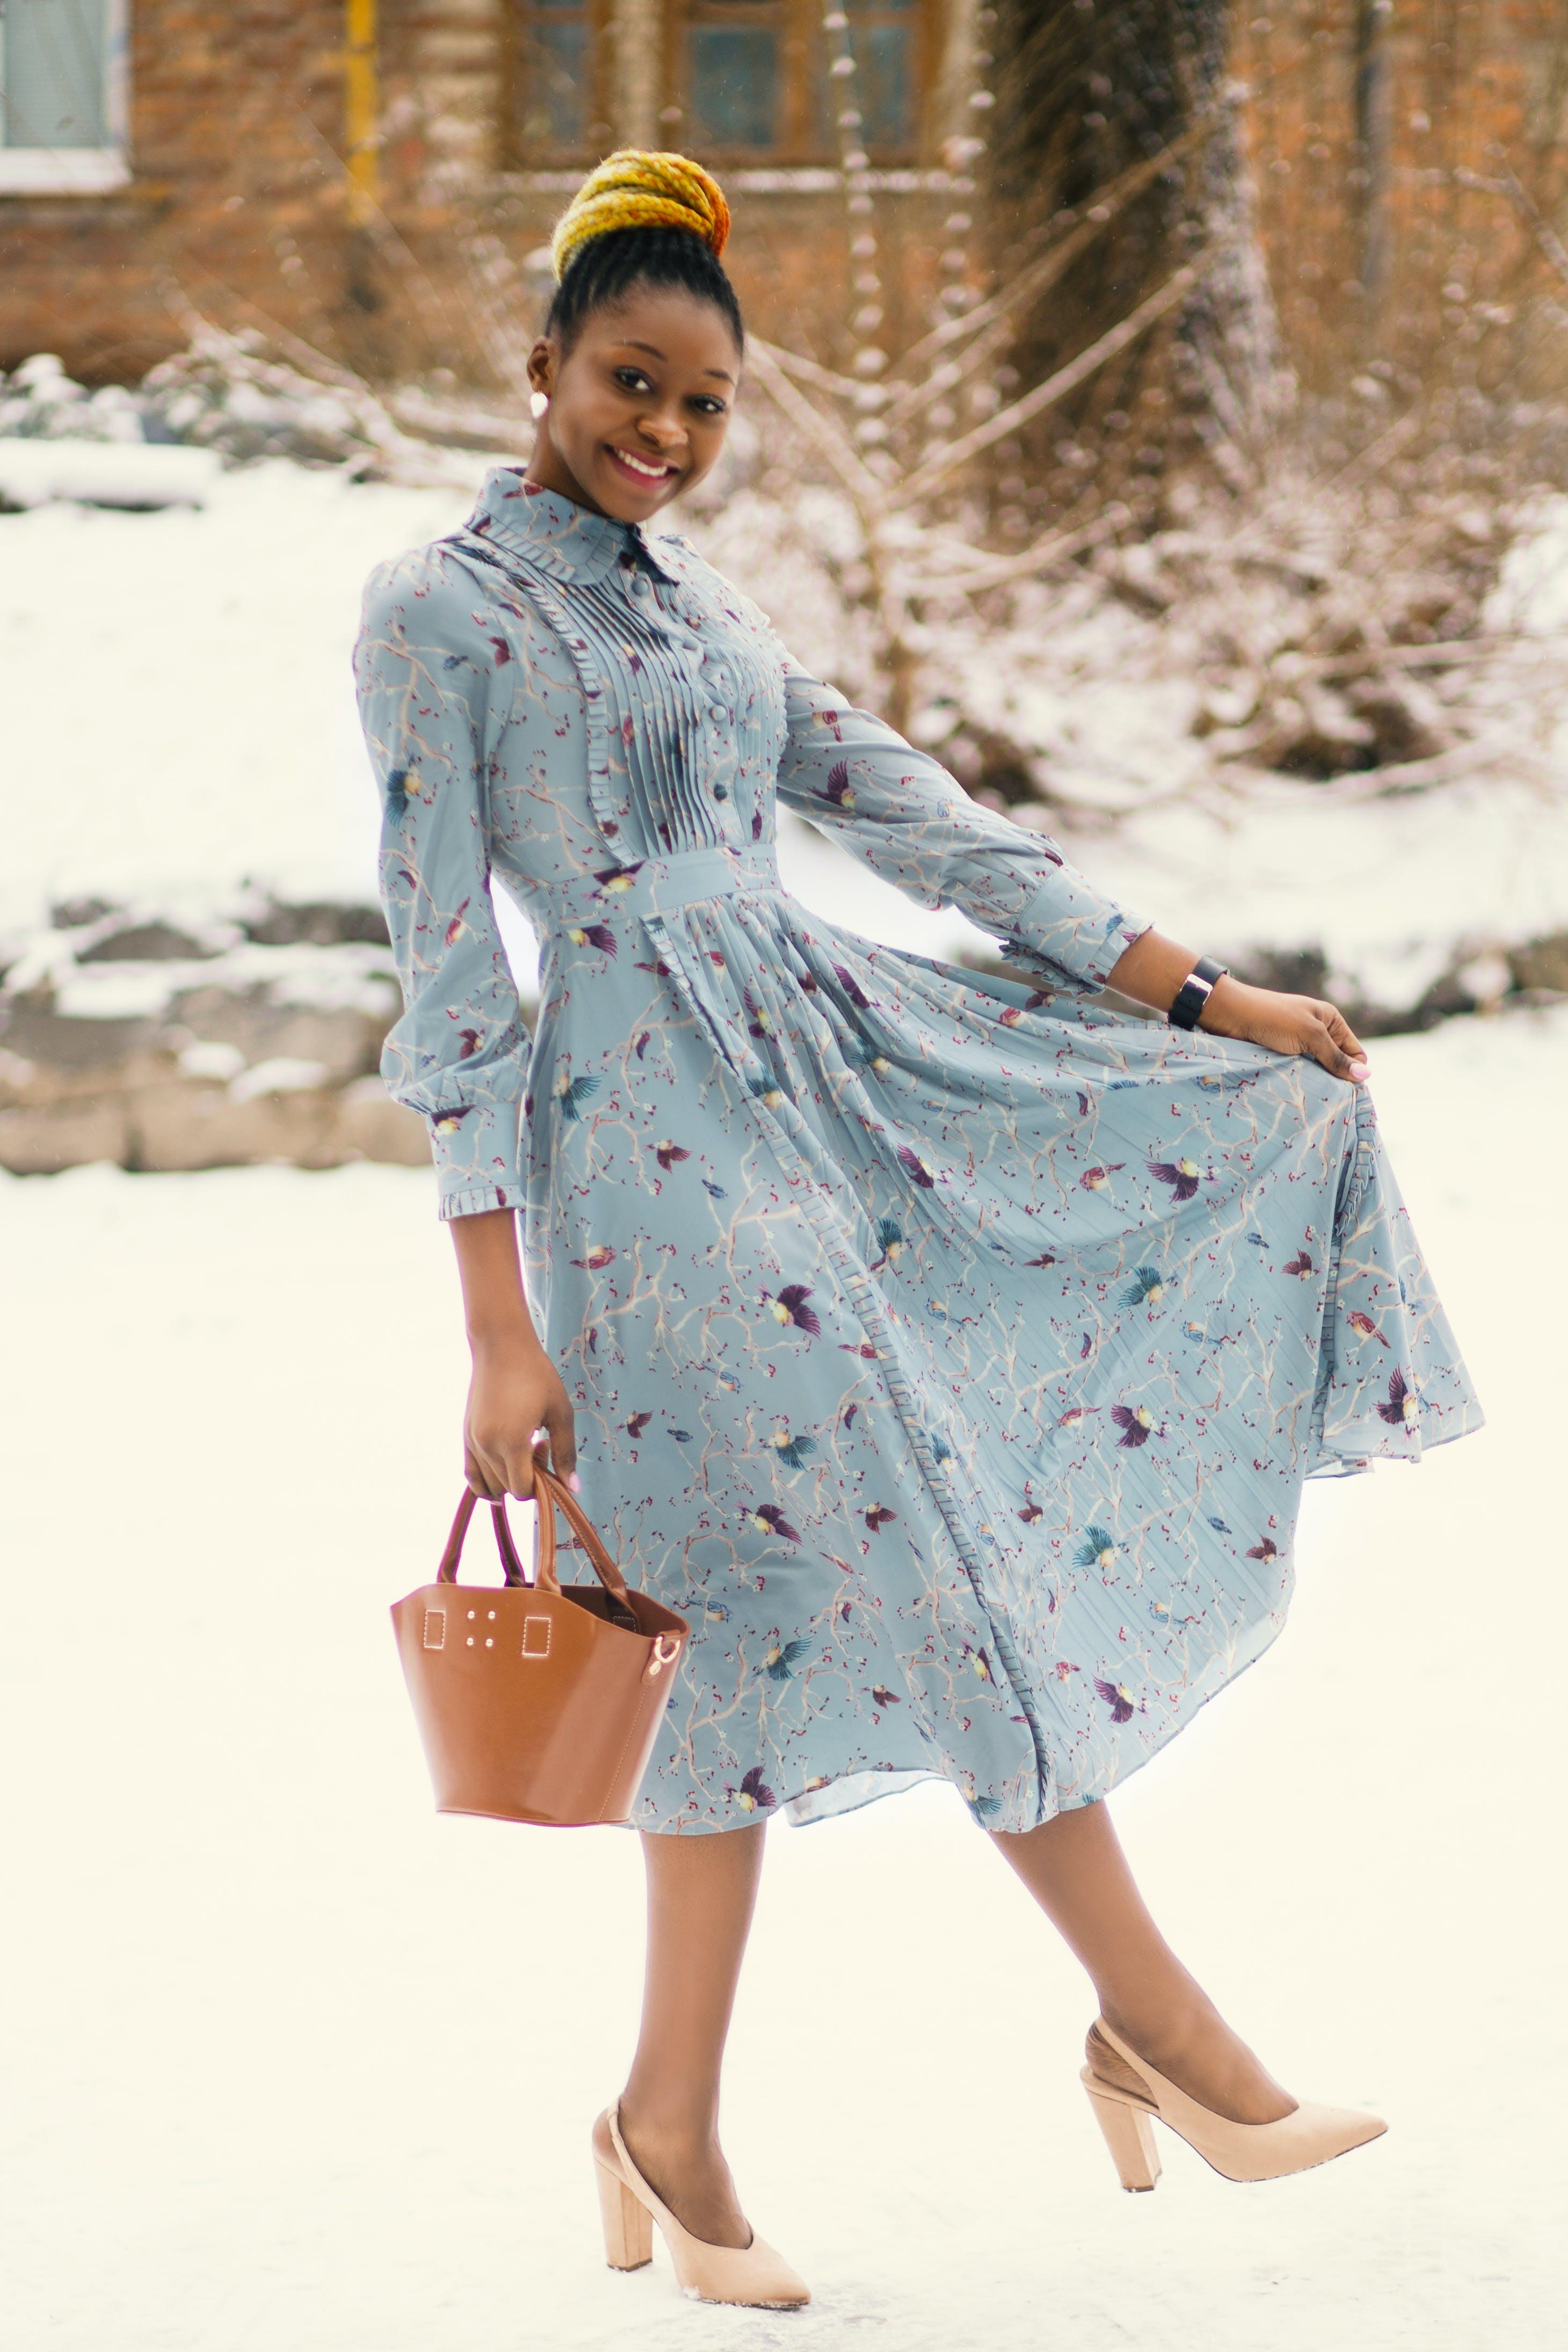 Photo of Woman Wearing Blue Long-sleeved Dress